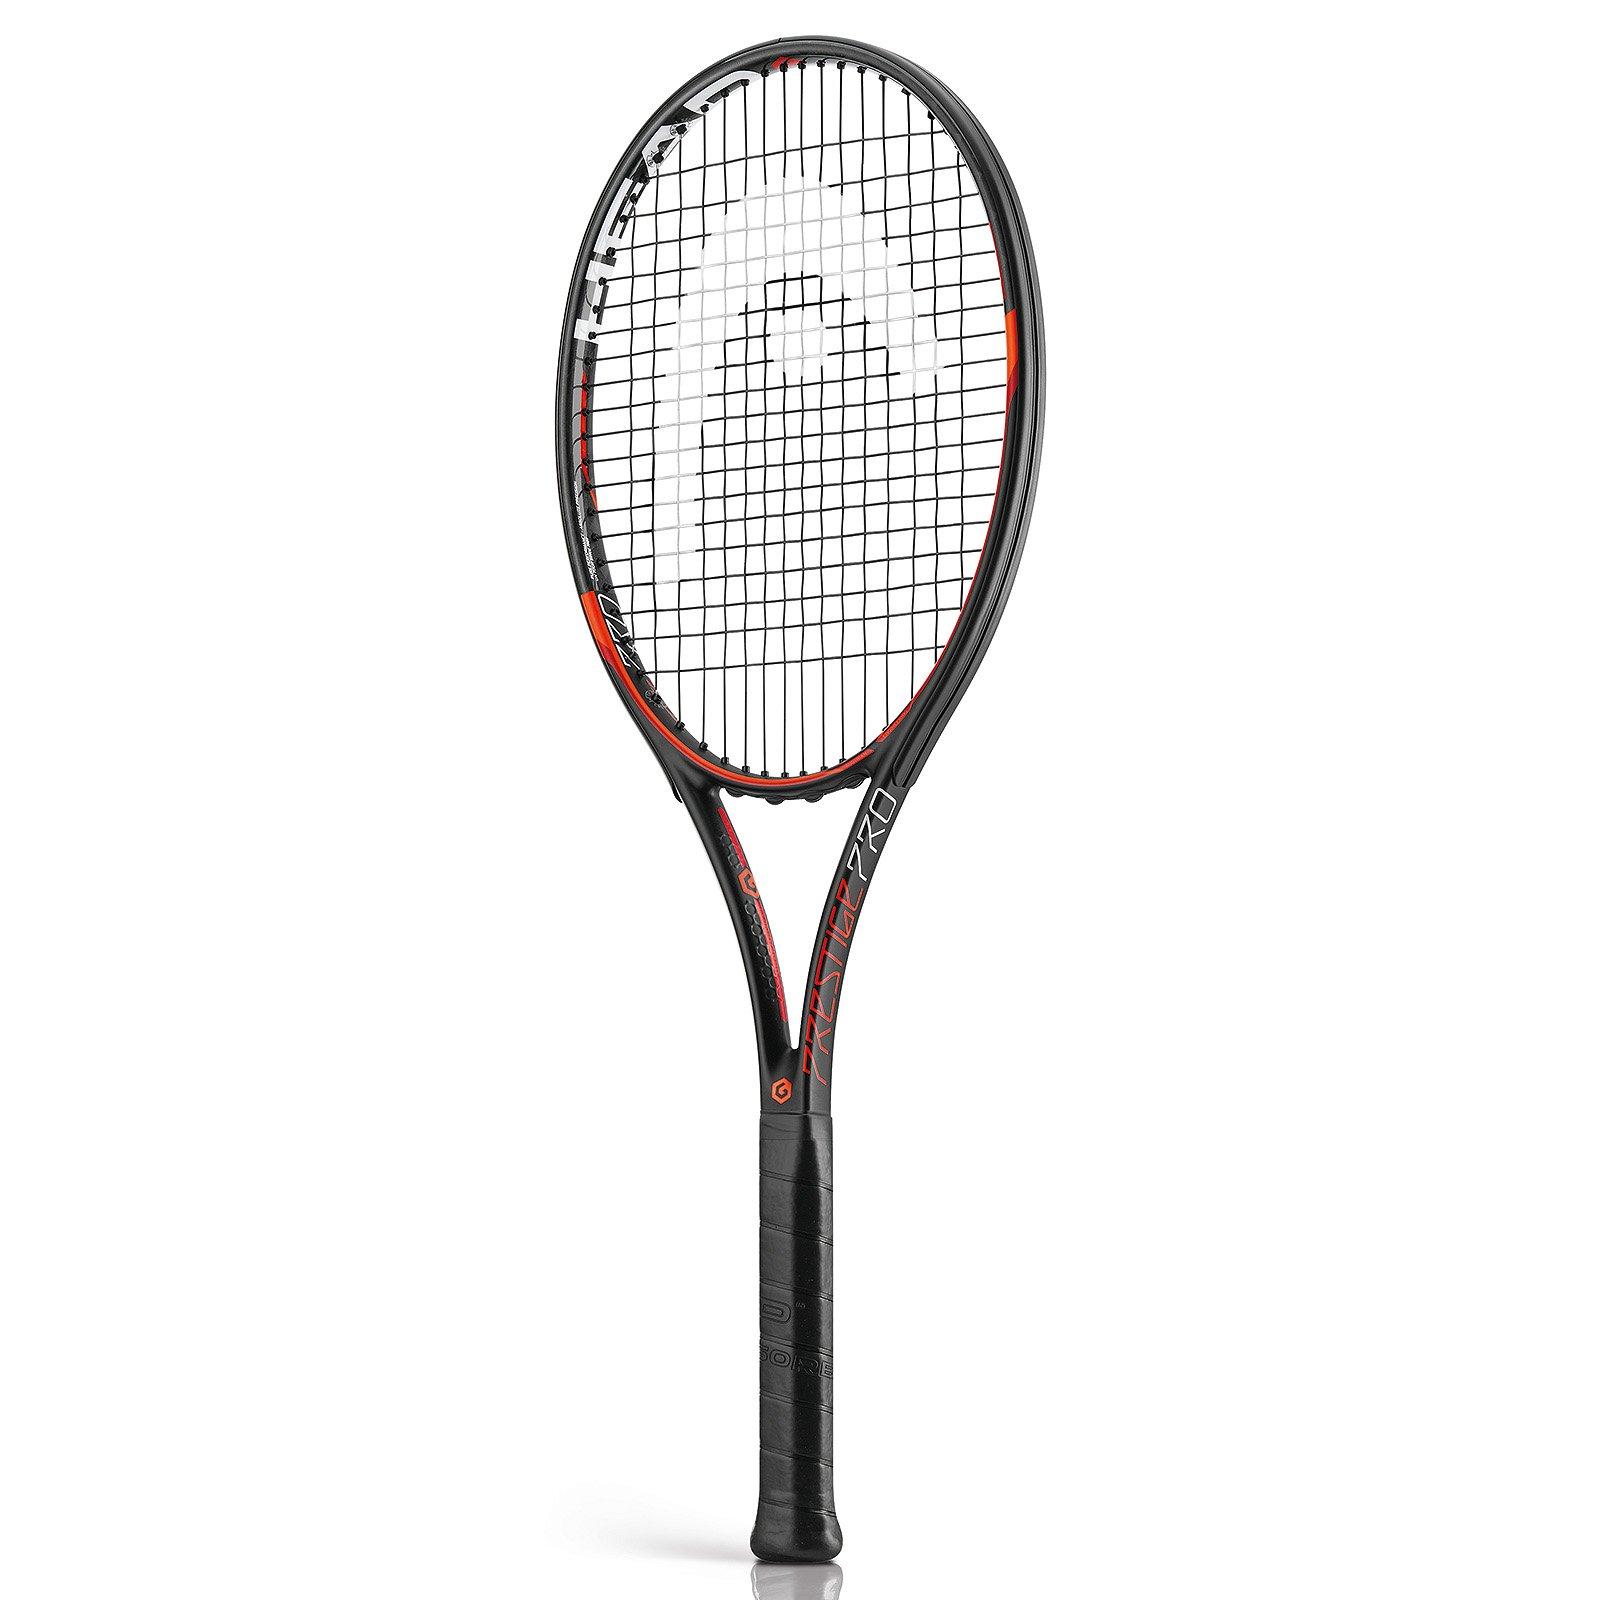 HEAD Graphene XT Prestige Pro Tennis Racquet, Unstrung, 4 3/8 Inch Grip by HEAD (Image #1)